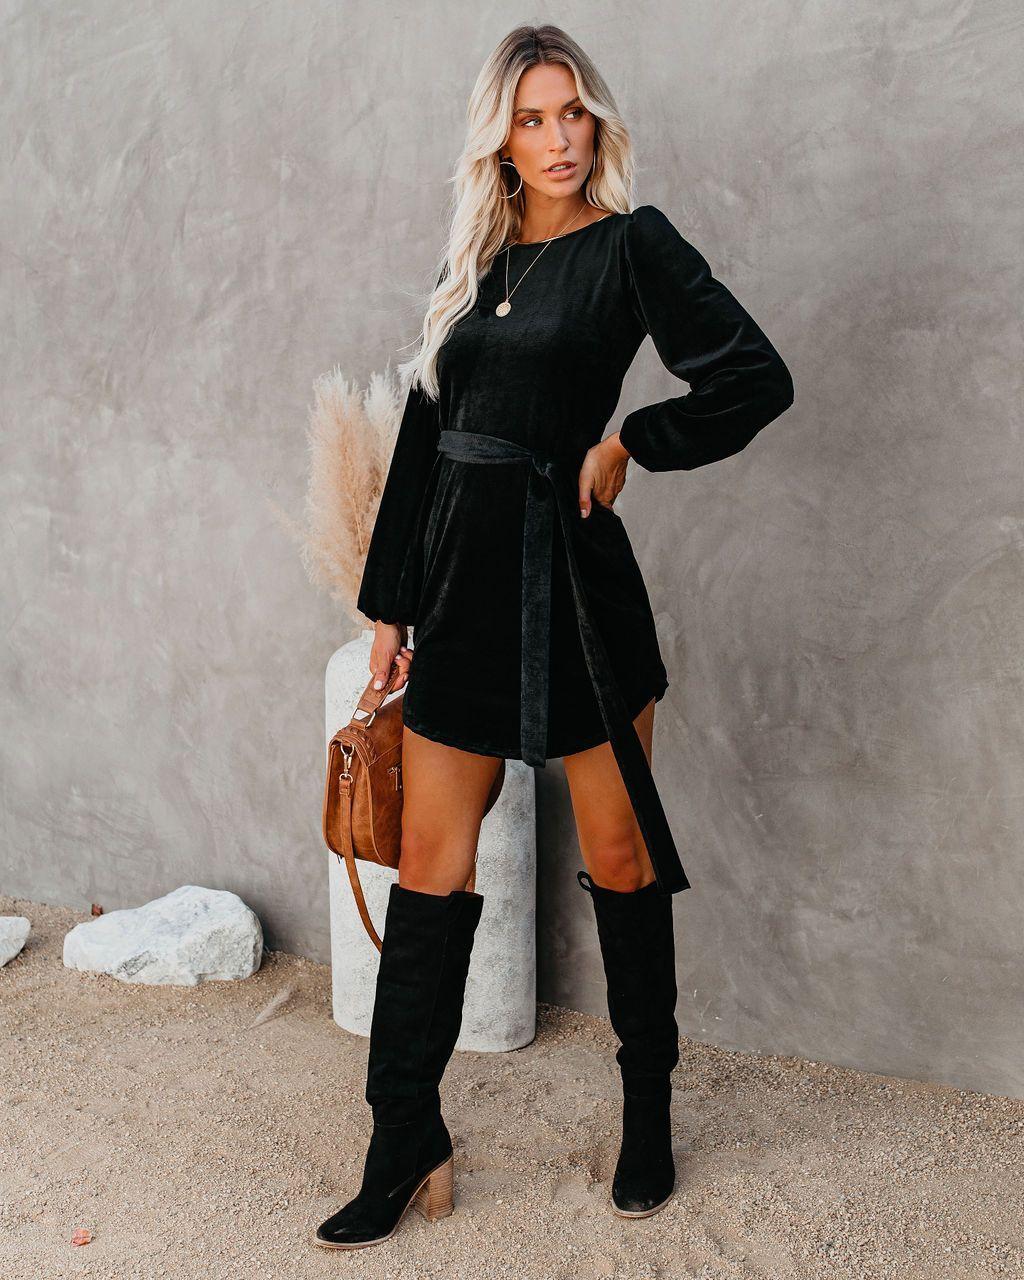 Companions Long Sleeve Corduroy Dress Black Large In 2021 Corduroy Dress Nfr Fashion Vici Dress [ 1280 x 1024 Pixel ]